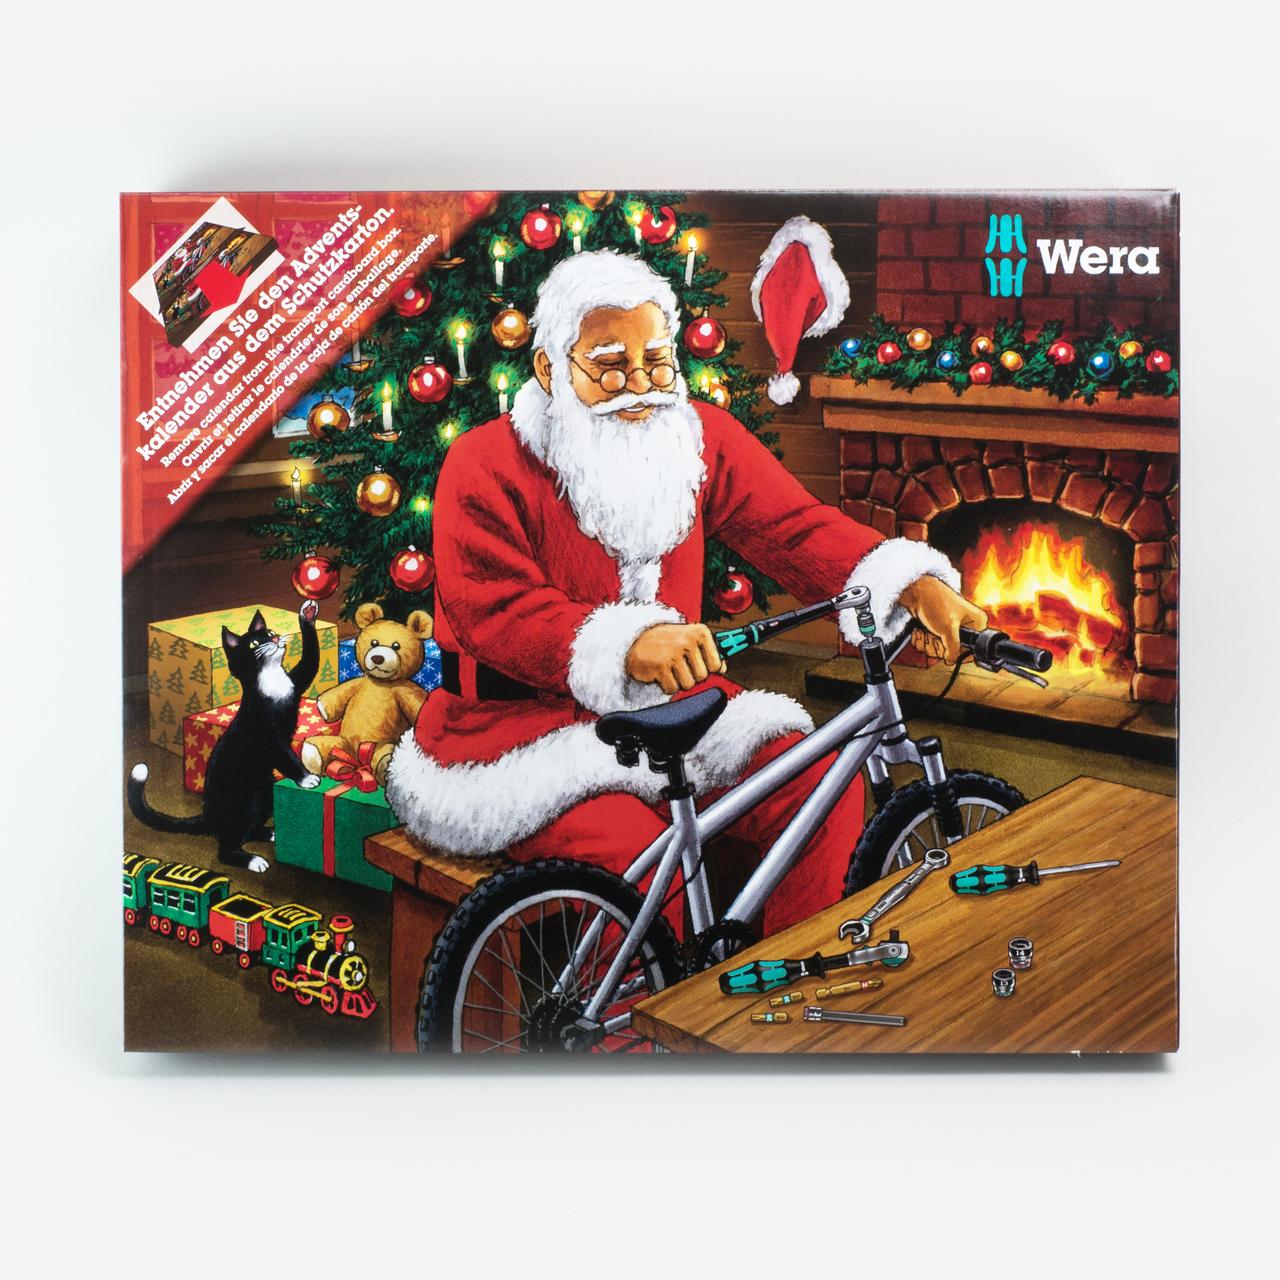 Wera Advent Calendar 2018 - KC Tool